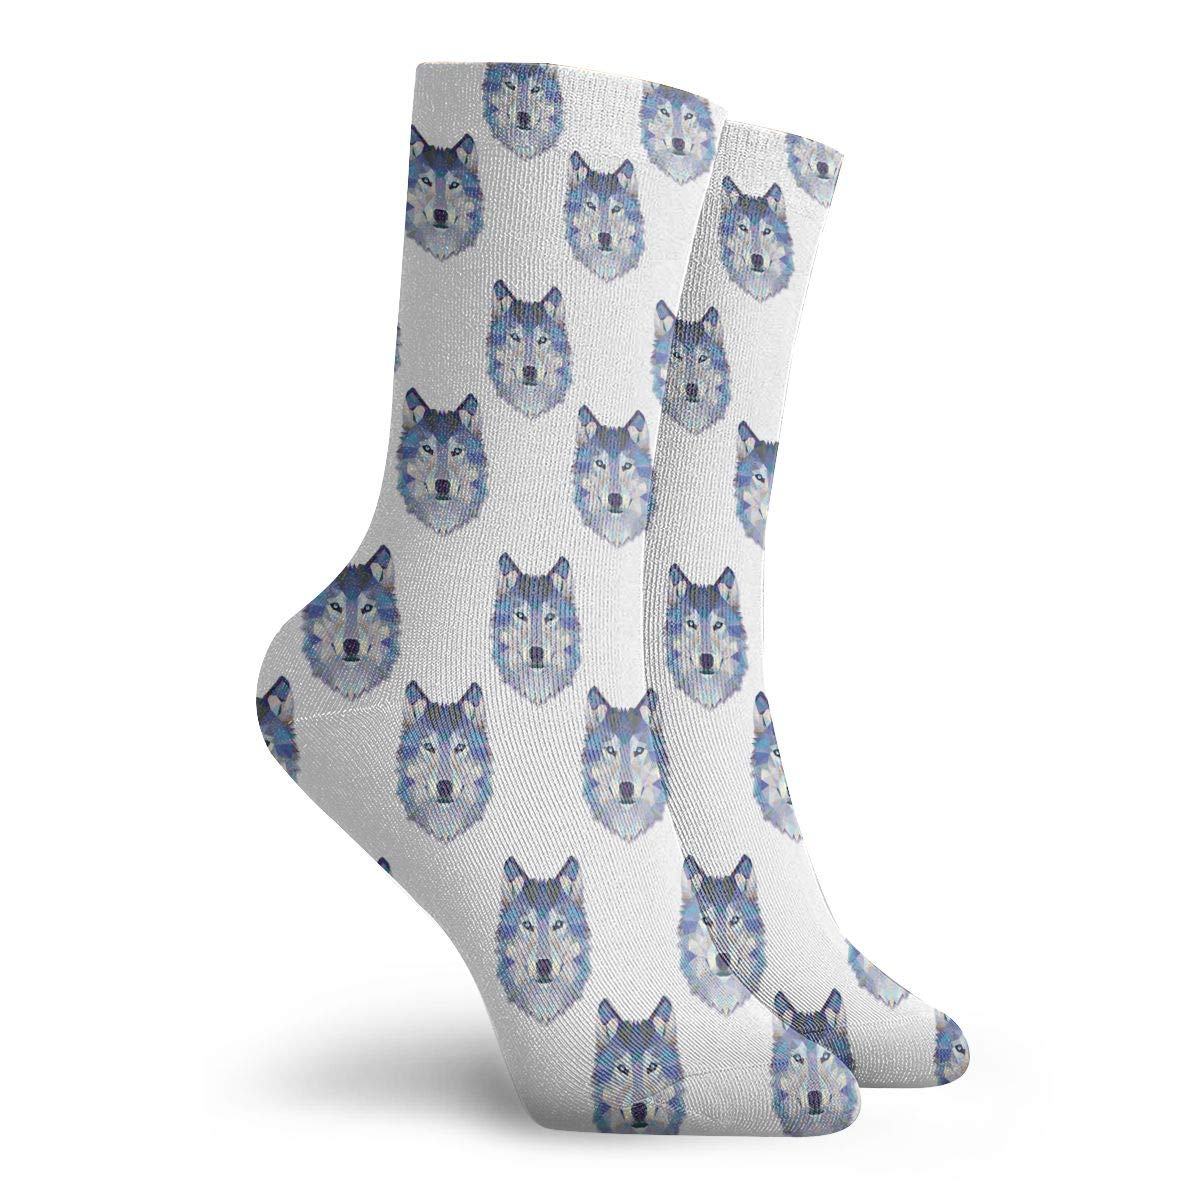 Wolf Head Unisex Funny Casual Crew Socks Athletic Socks For Boys Girls Kids Teenagers